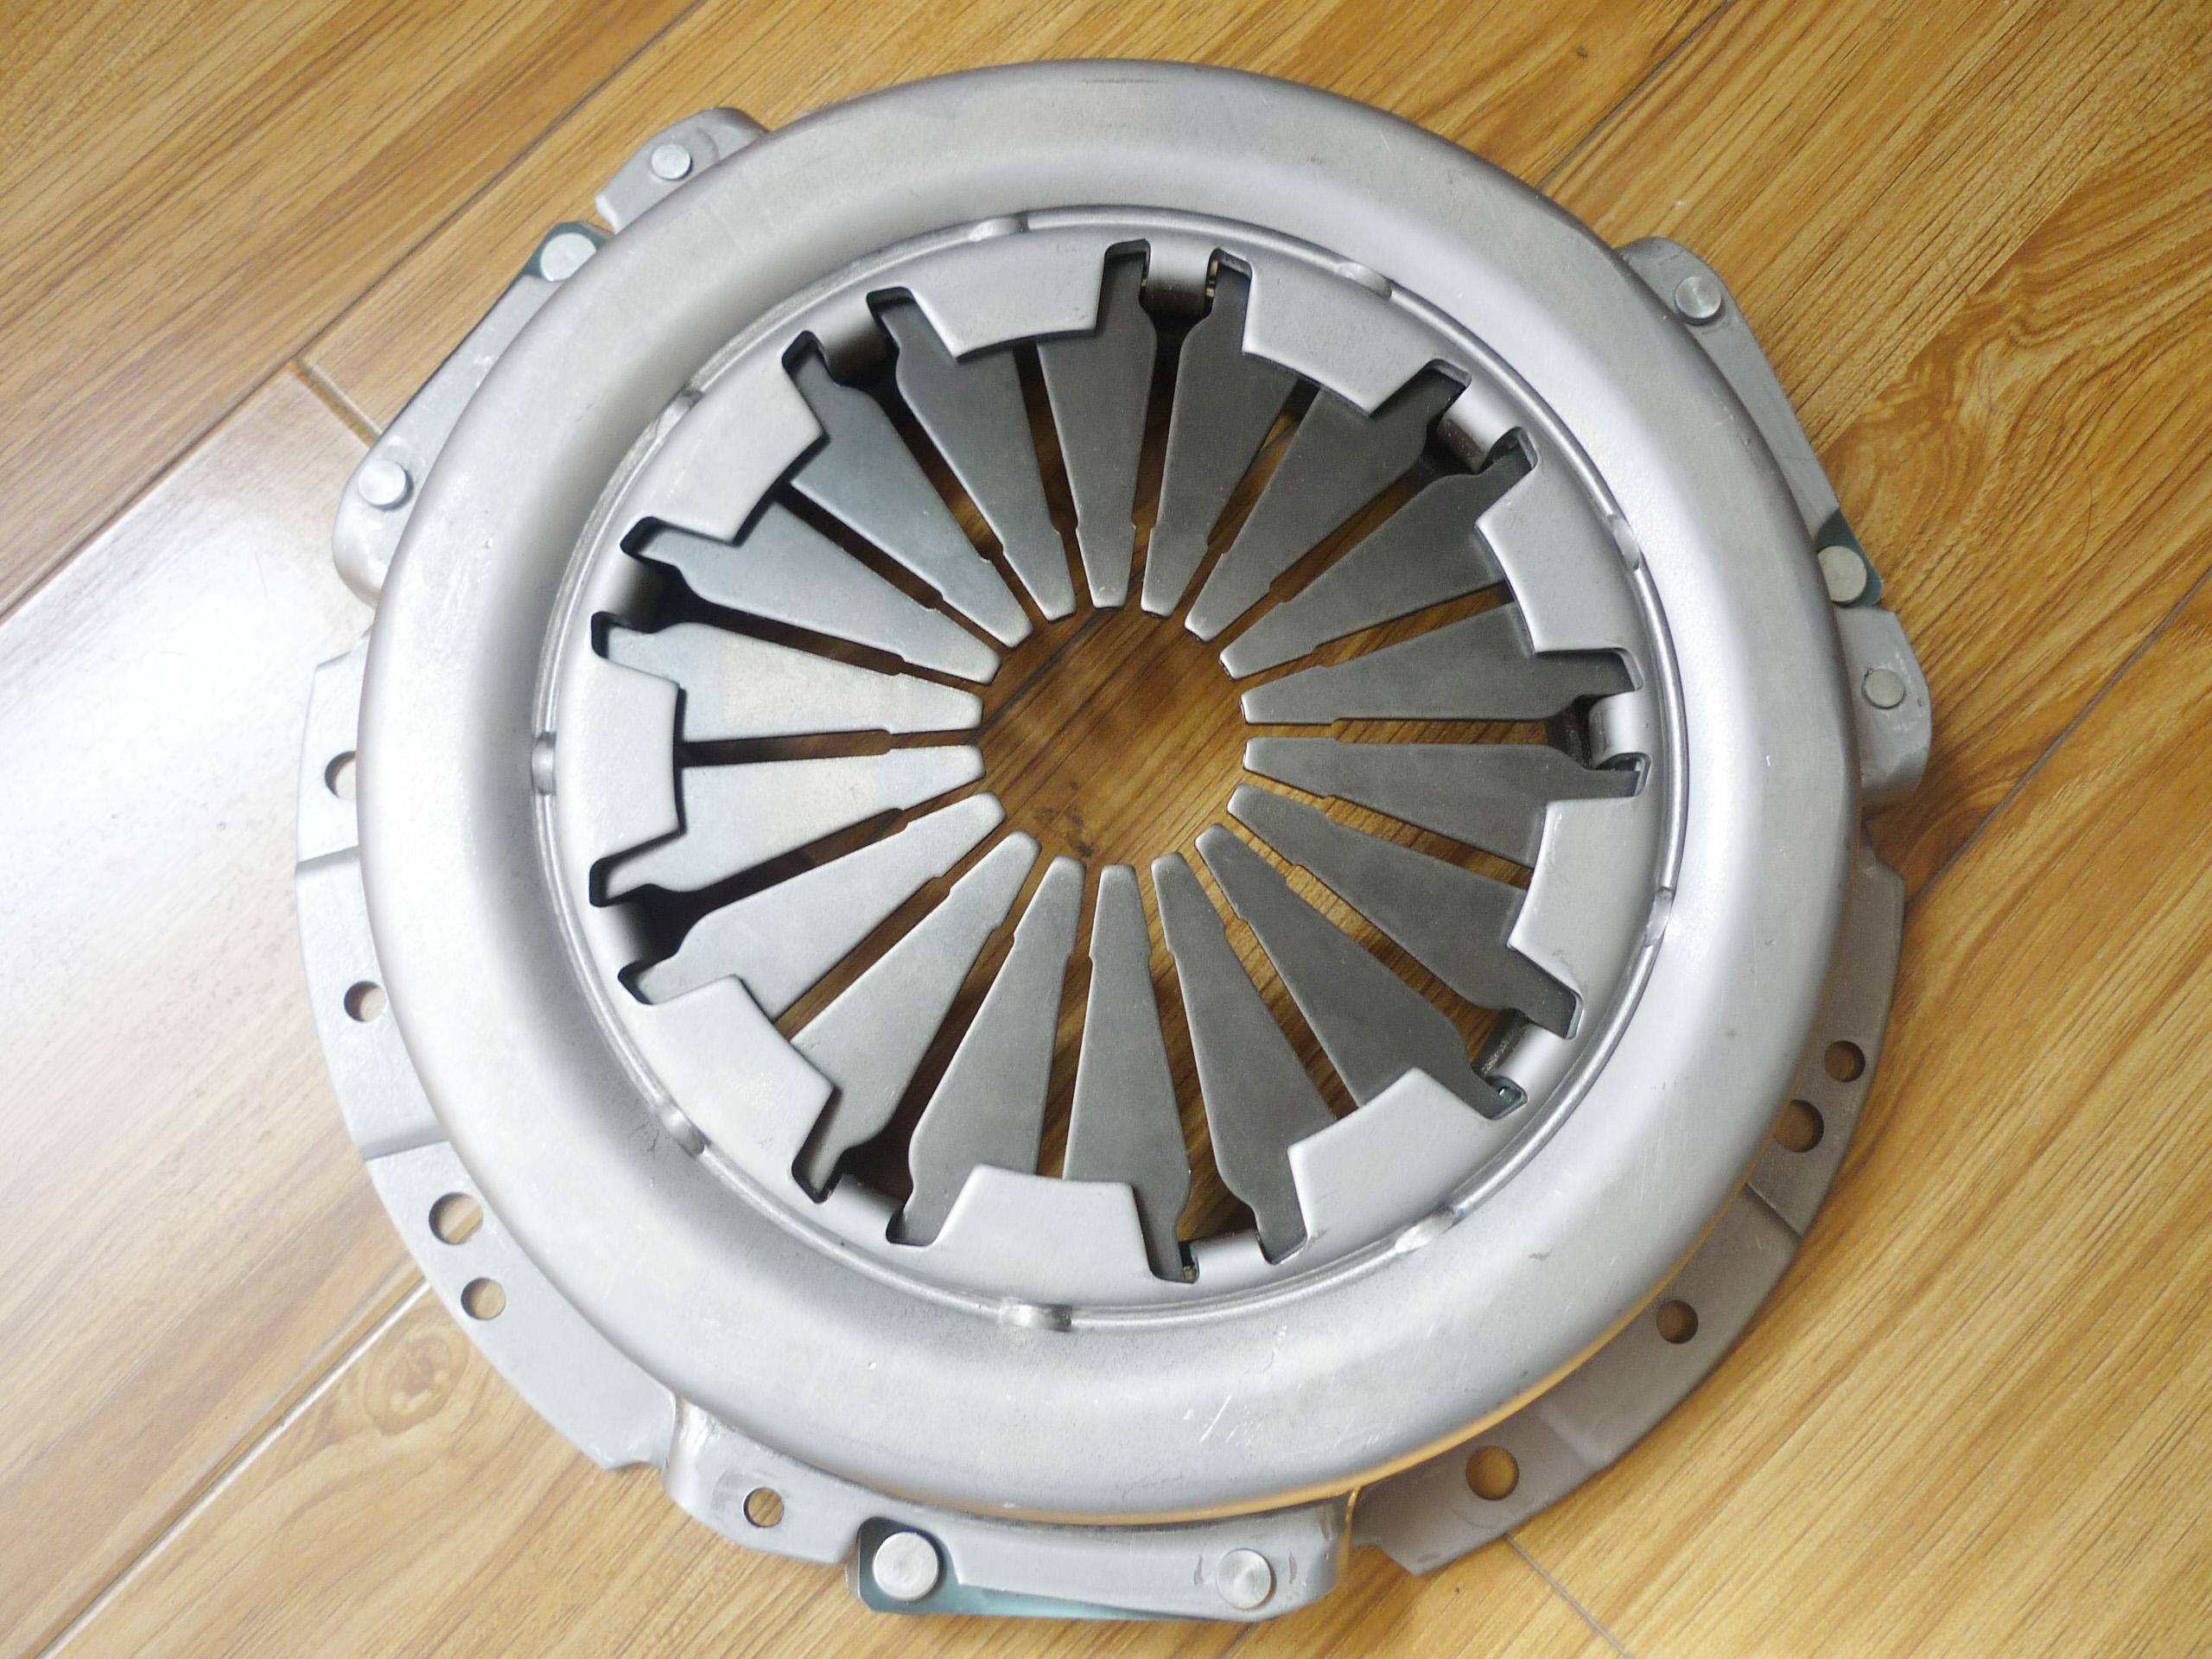 Clutch Disc for OPE ASTRA CORSA 1.6 3 020 VLA 06B 1 020 V17 03B INAF-229422.1